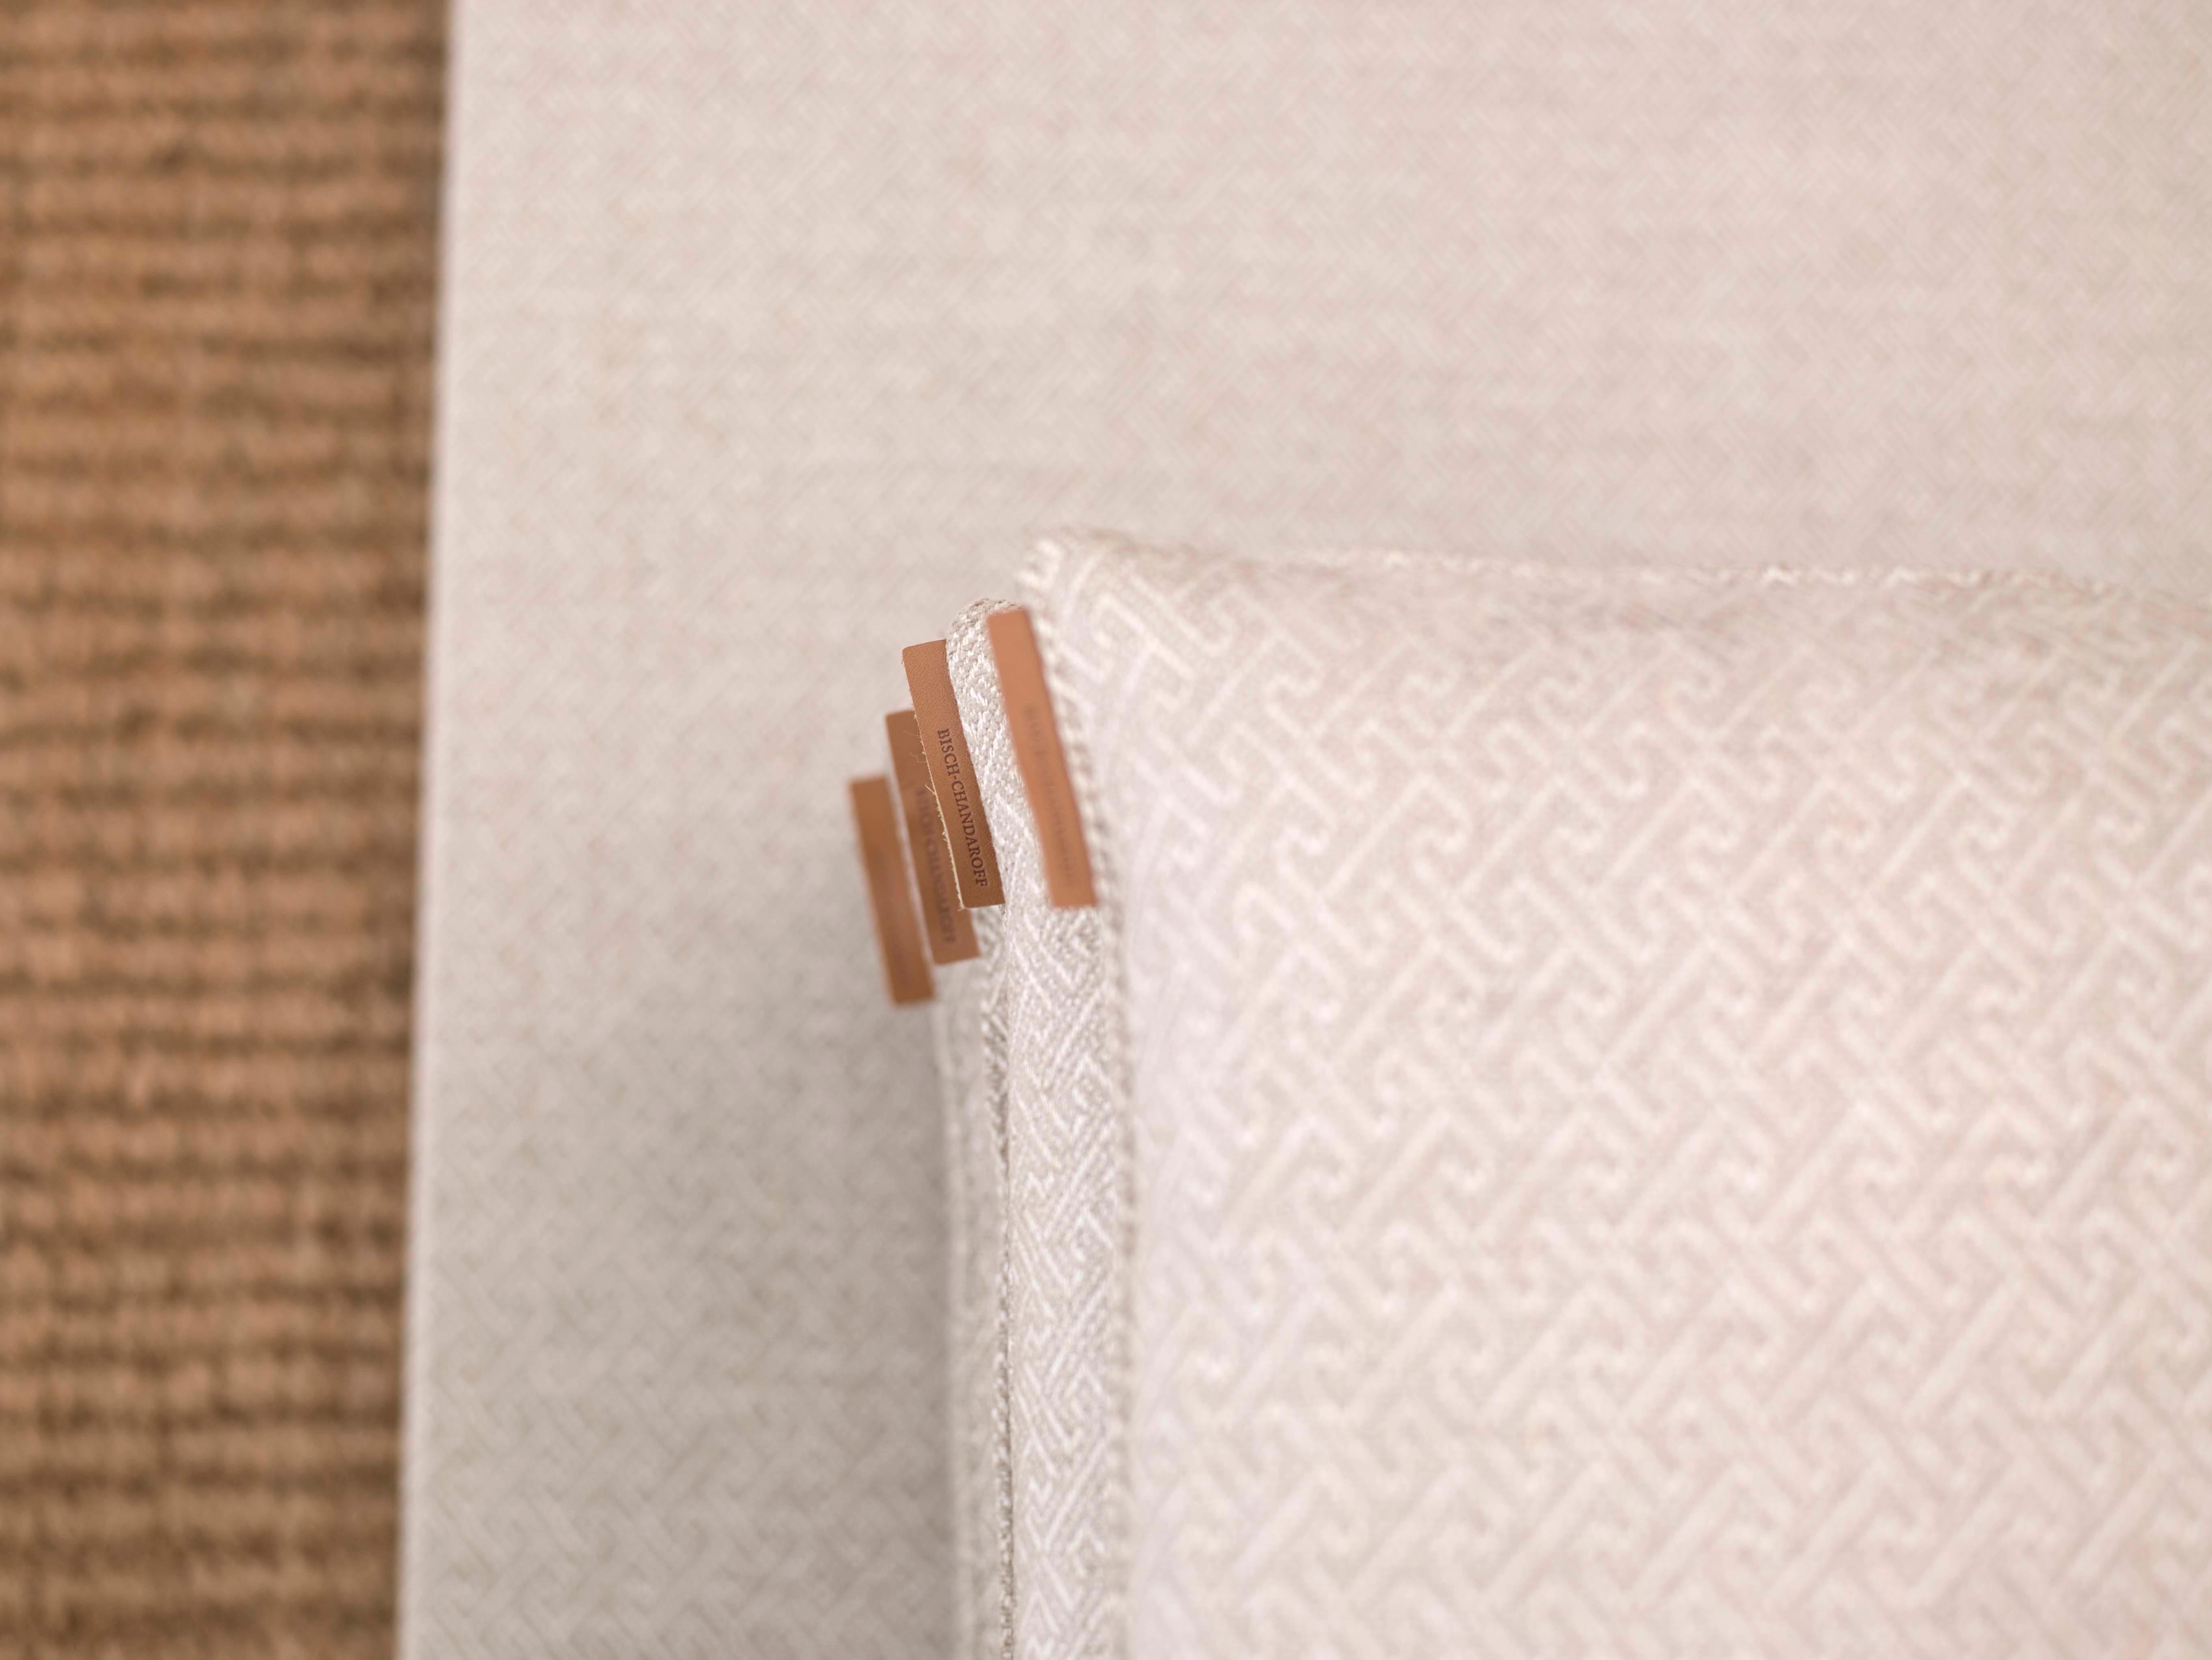 freie innenarchitektin stefanie kilimann in dresden lahmannring 1b. Black Bedroom Furniture Sets. Home Design Ideas